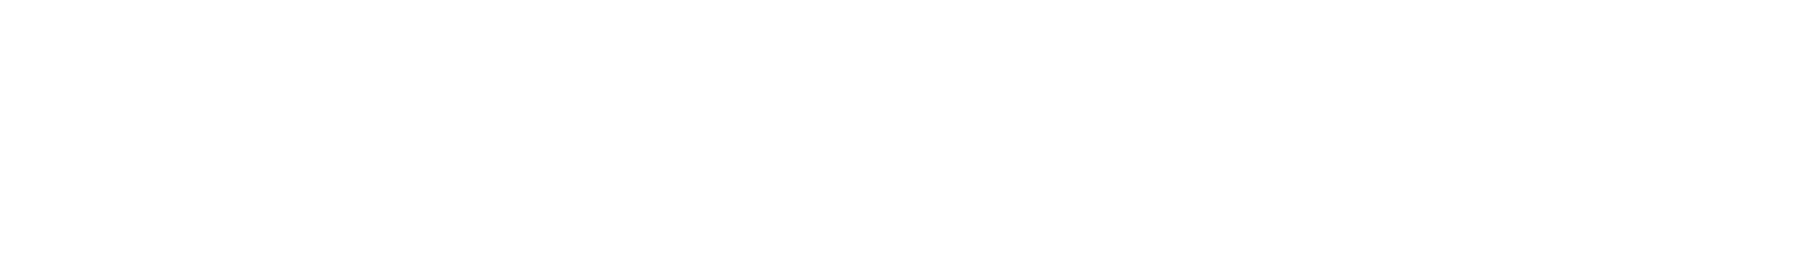 g abs05 090